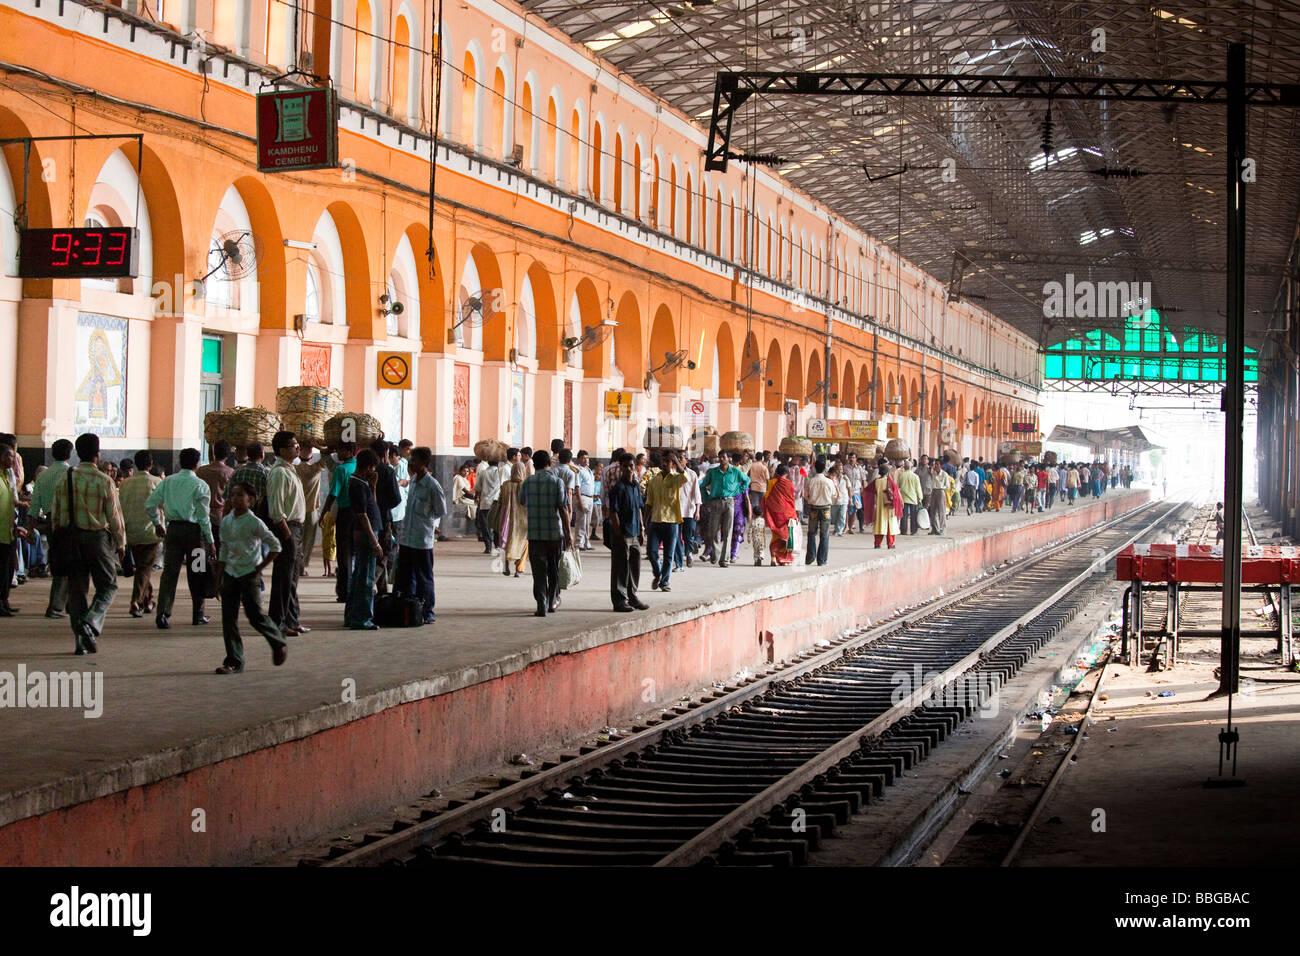 Passengers Wait On The Platform At Sealdah Railway Station